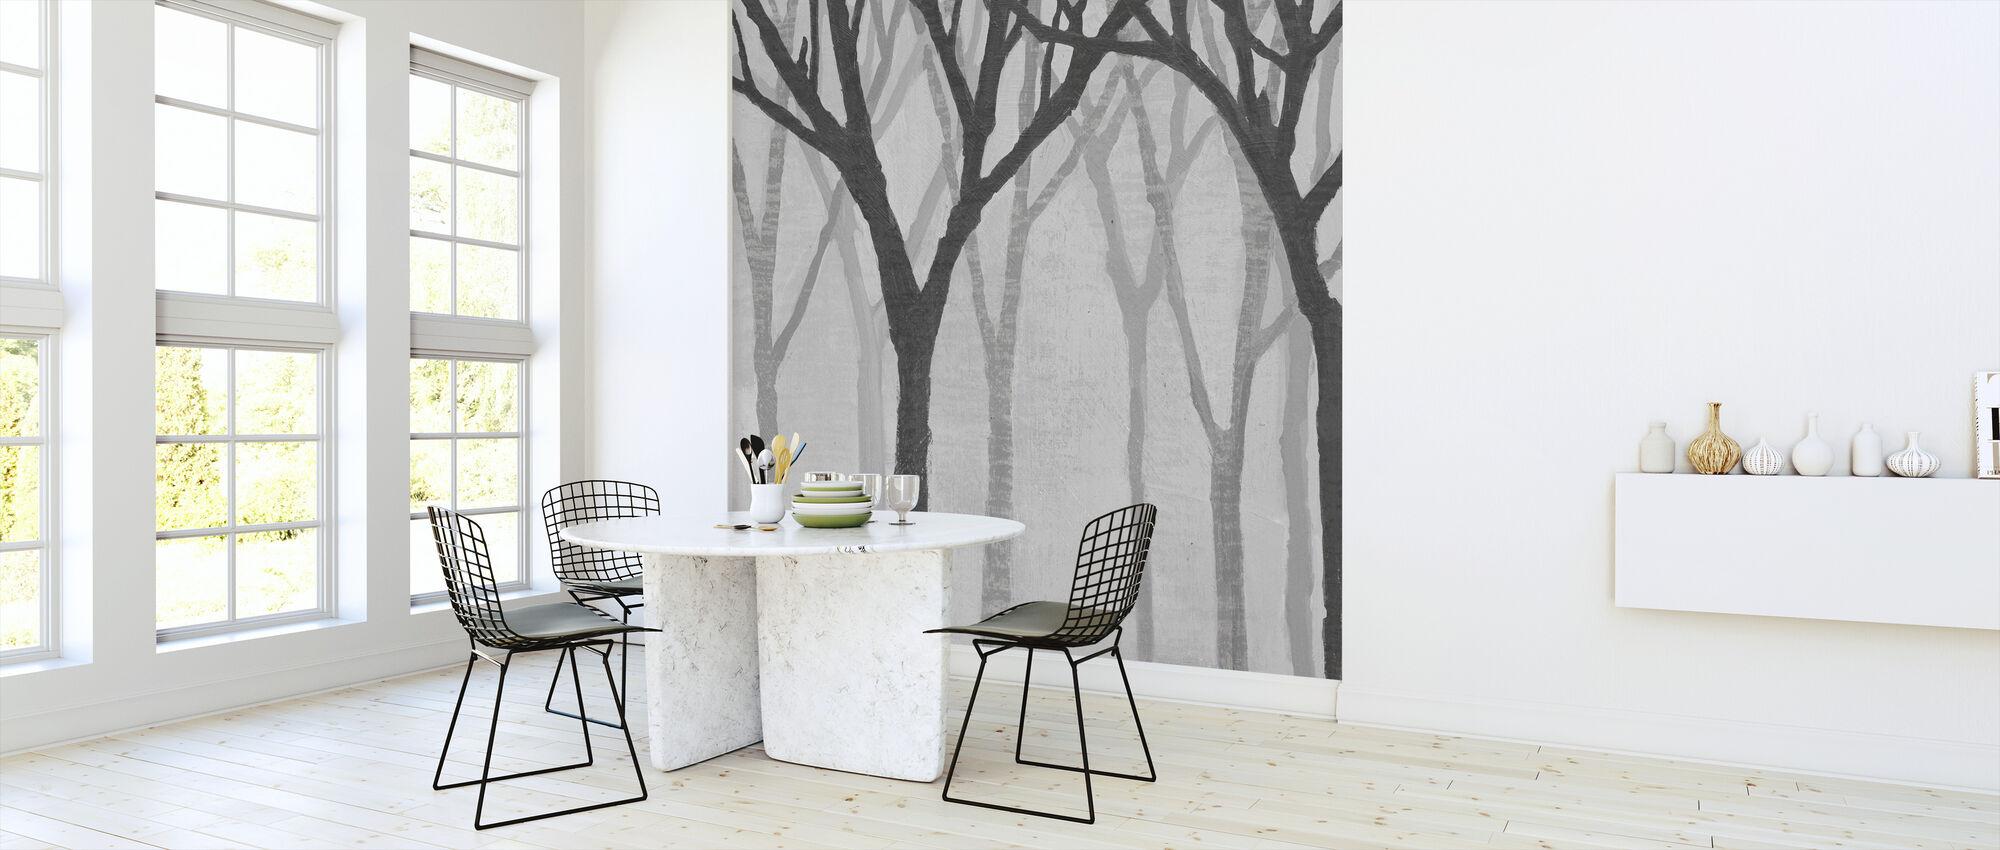 Spring Trees Greystone - Wallpaper - Kitchen